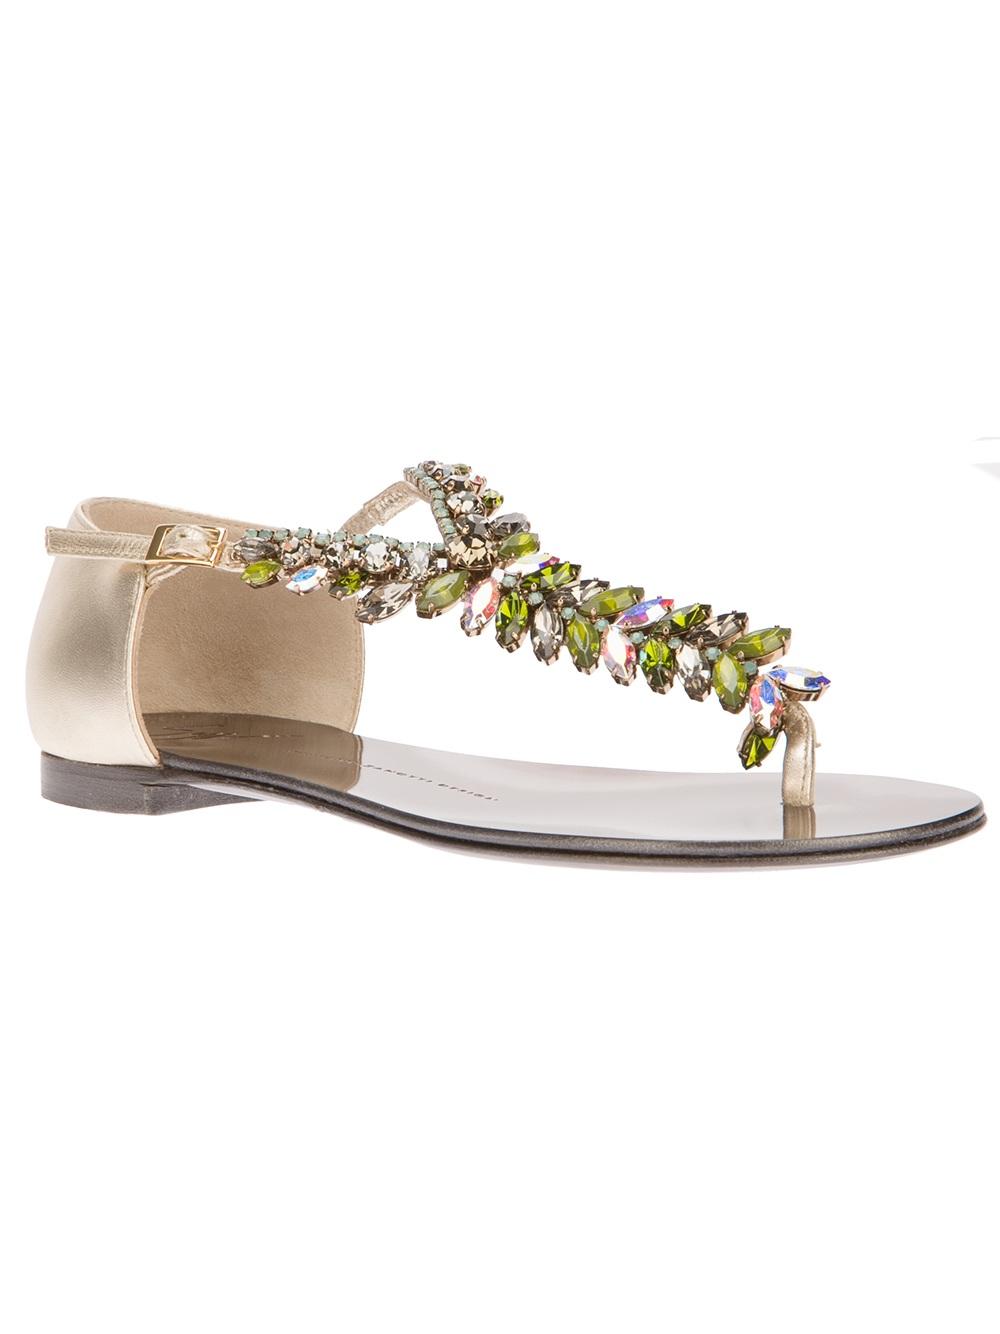 Zanotti Jeweled Amazon 5b60e Giuseppe F8002 Sandals 3Rjq5L4A